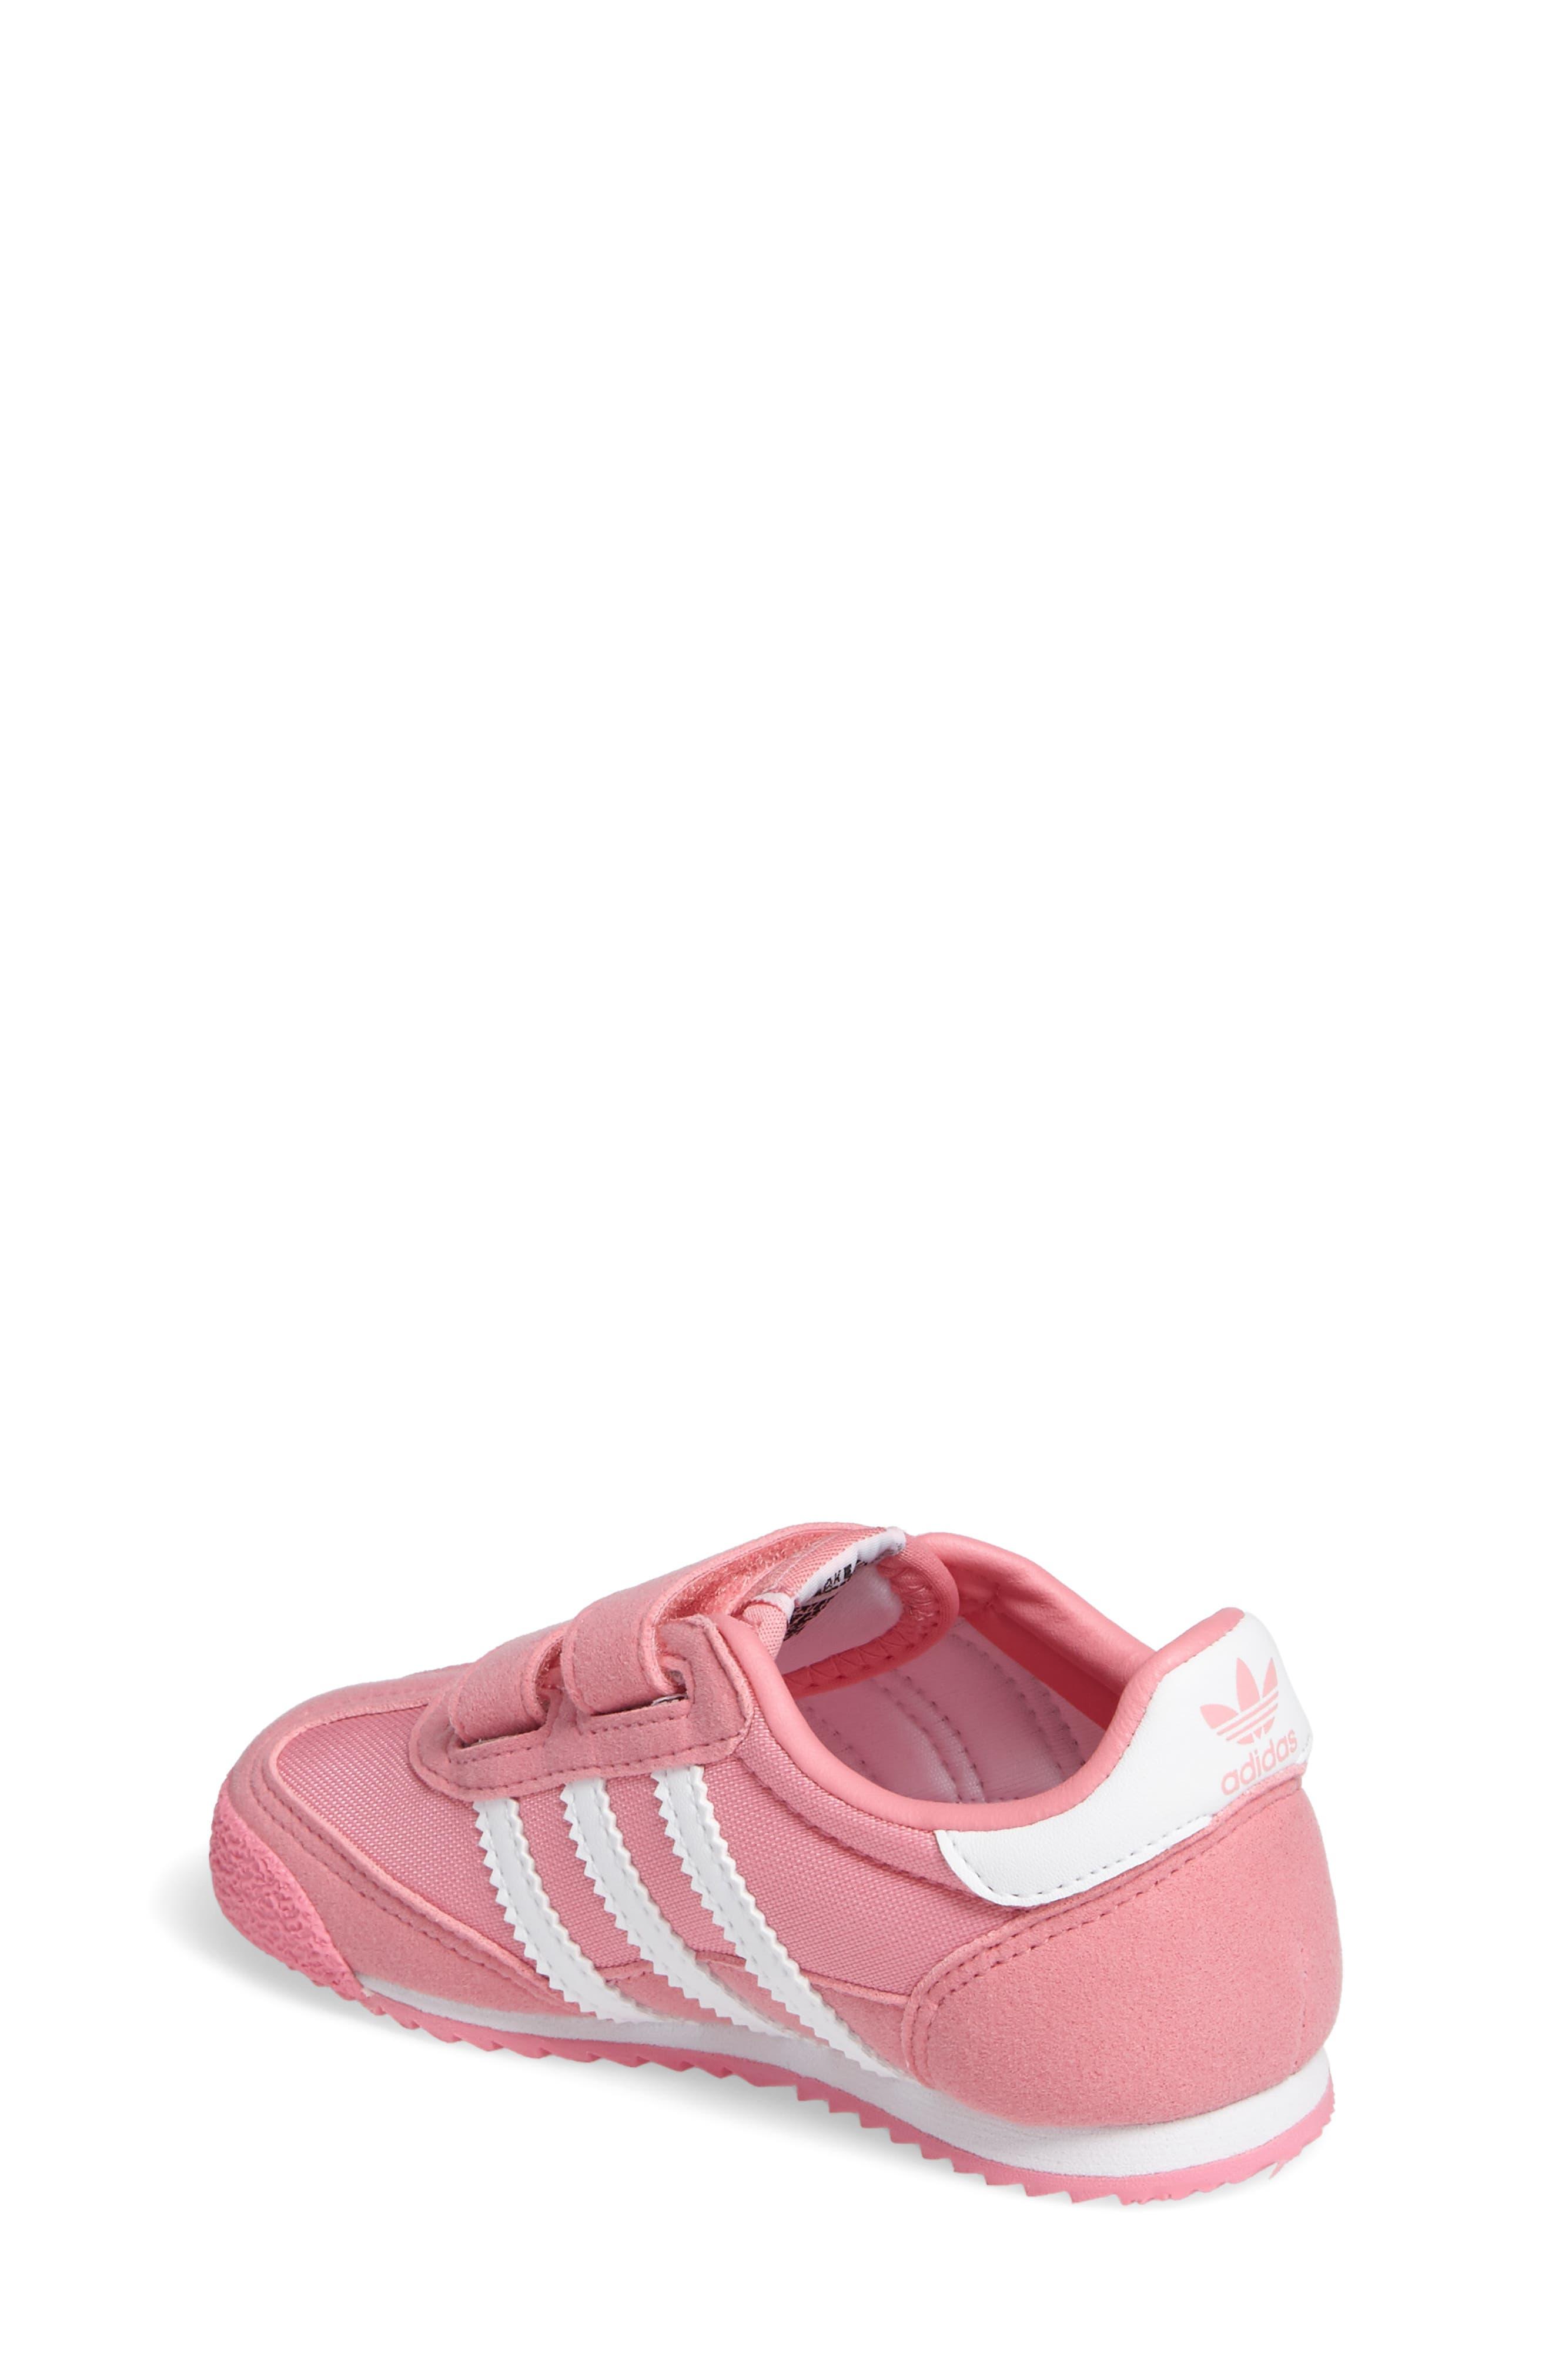 Dragon OG CF Athletic Shoe,                             Alternate thumbnail 2, color,                             683